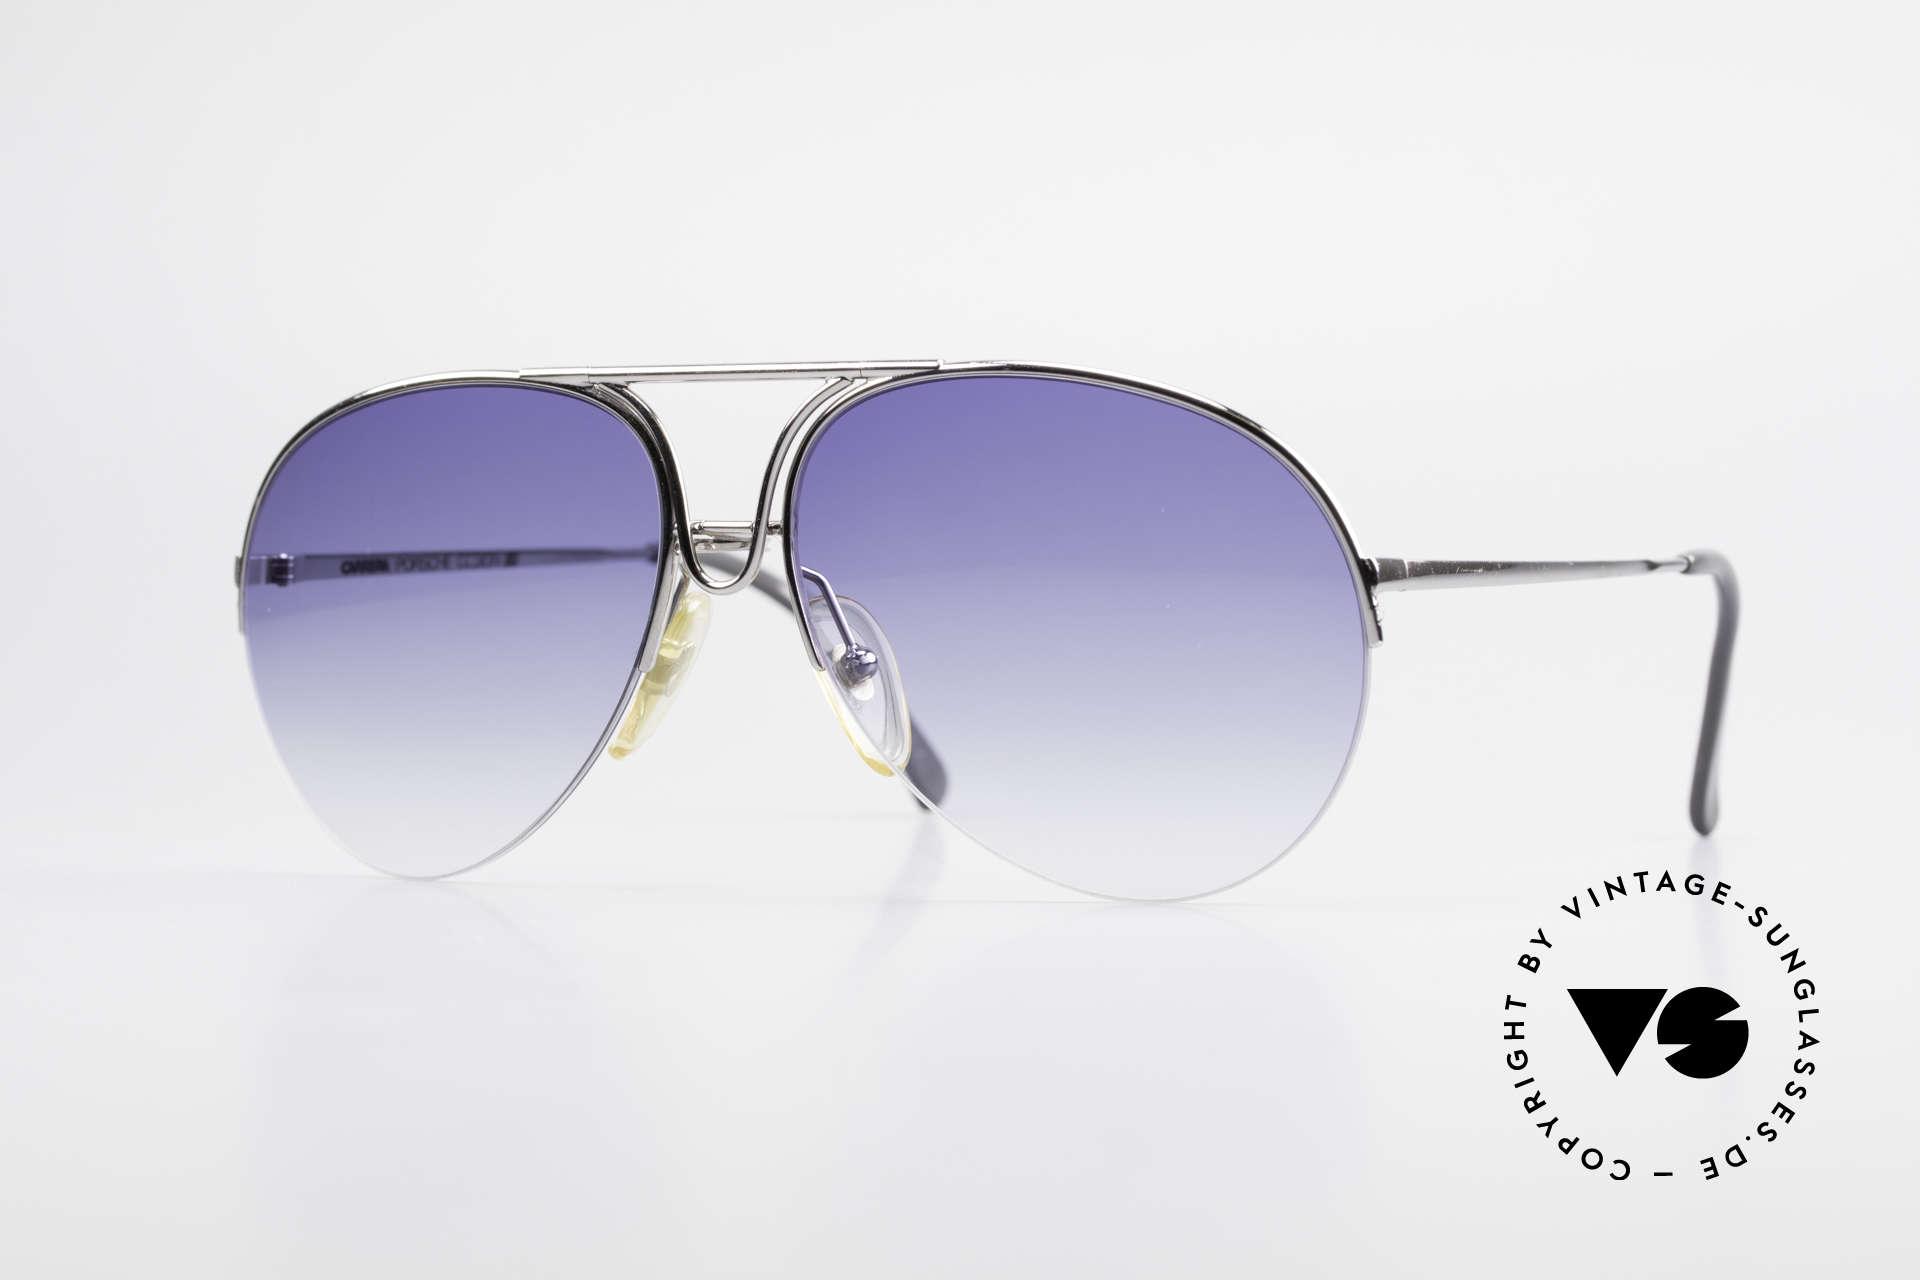 Porsche 5627 Semi Rimless 90's Sunglasses, noble designer sunglasses by PORSCHE DESIGN, Made for Men